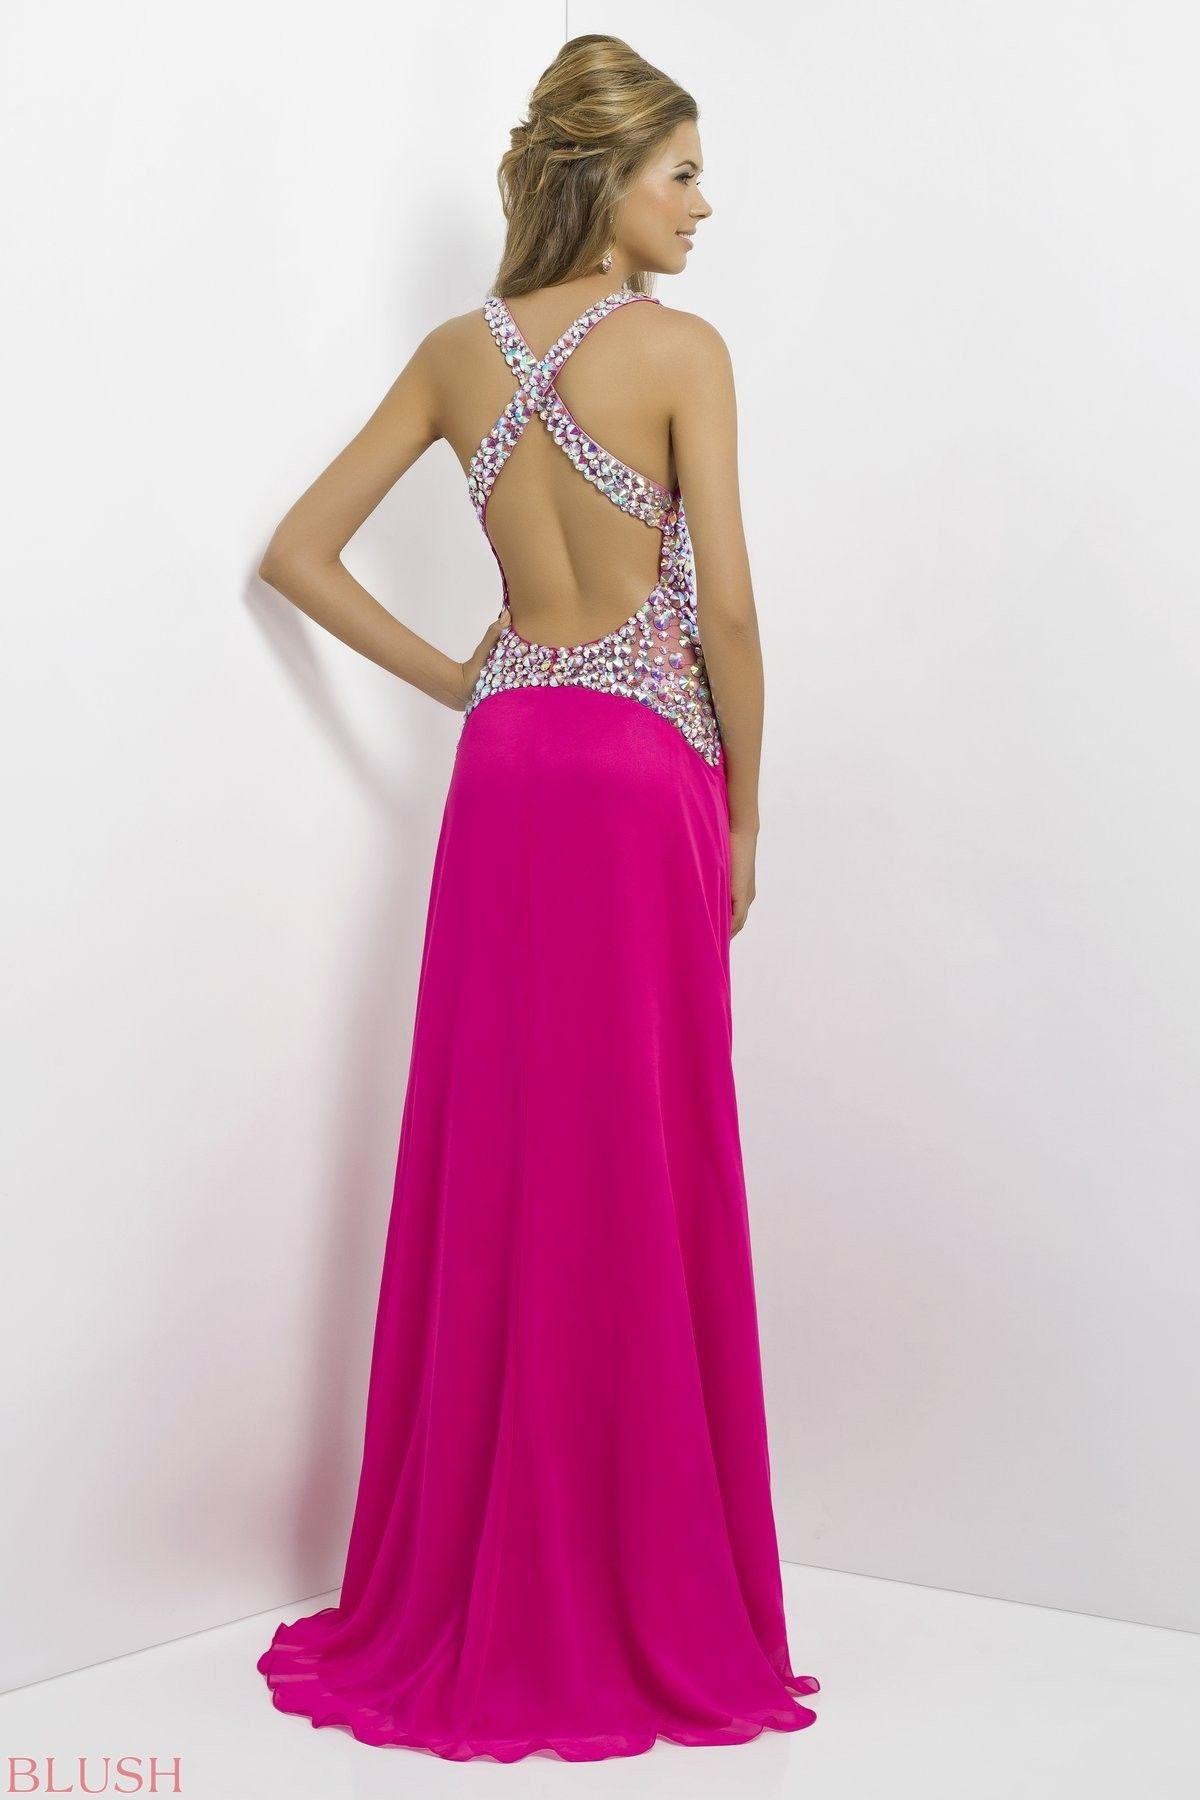 Blush Prom Style 9708 $559.99 Blush   bridesmaid dress collection ...